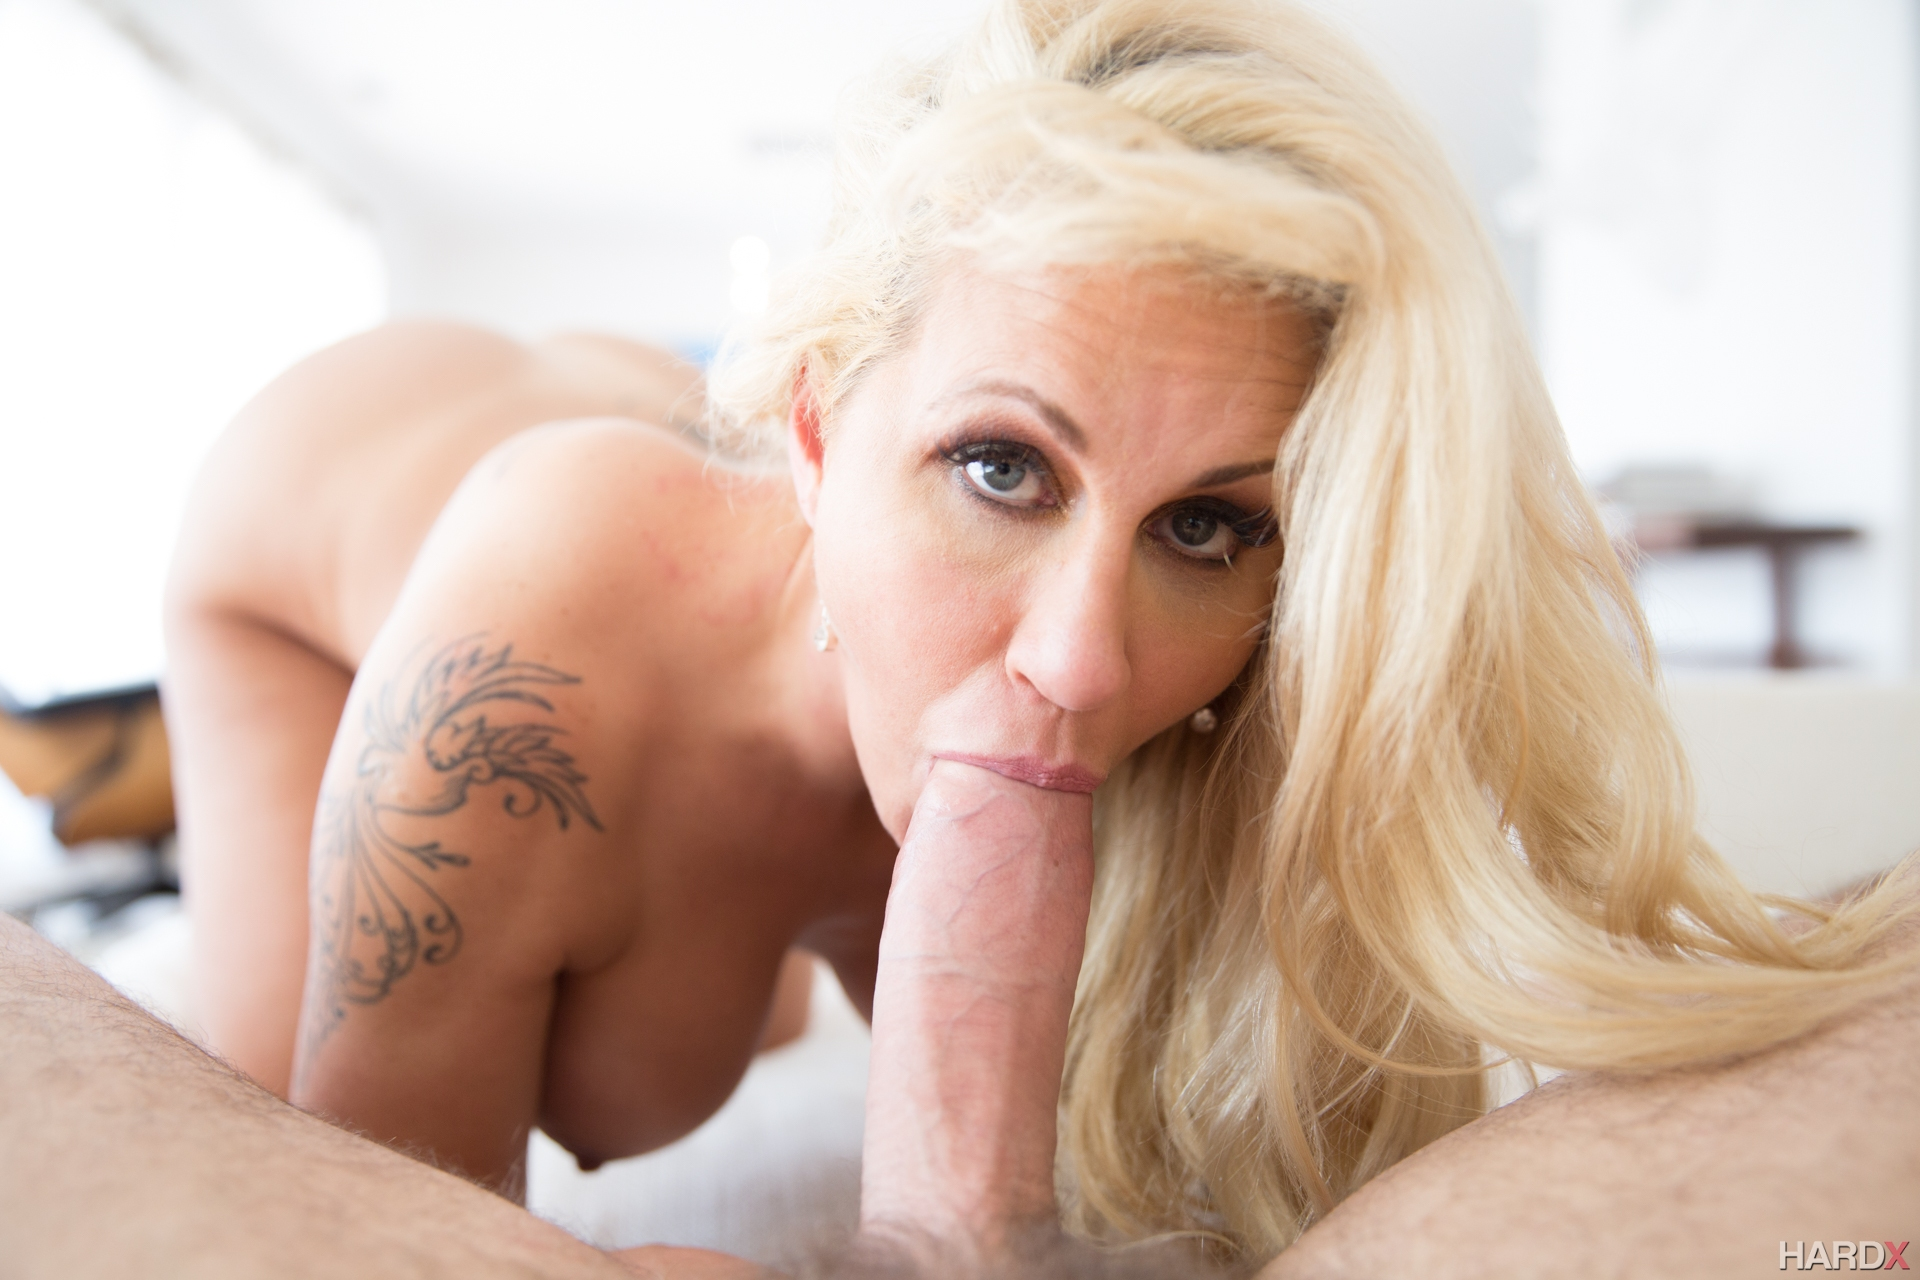 profesional putas sexo anal